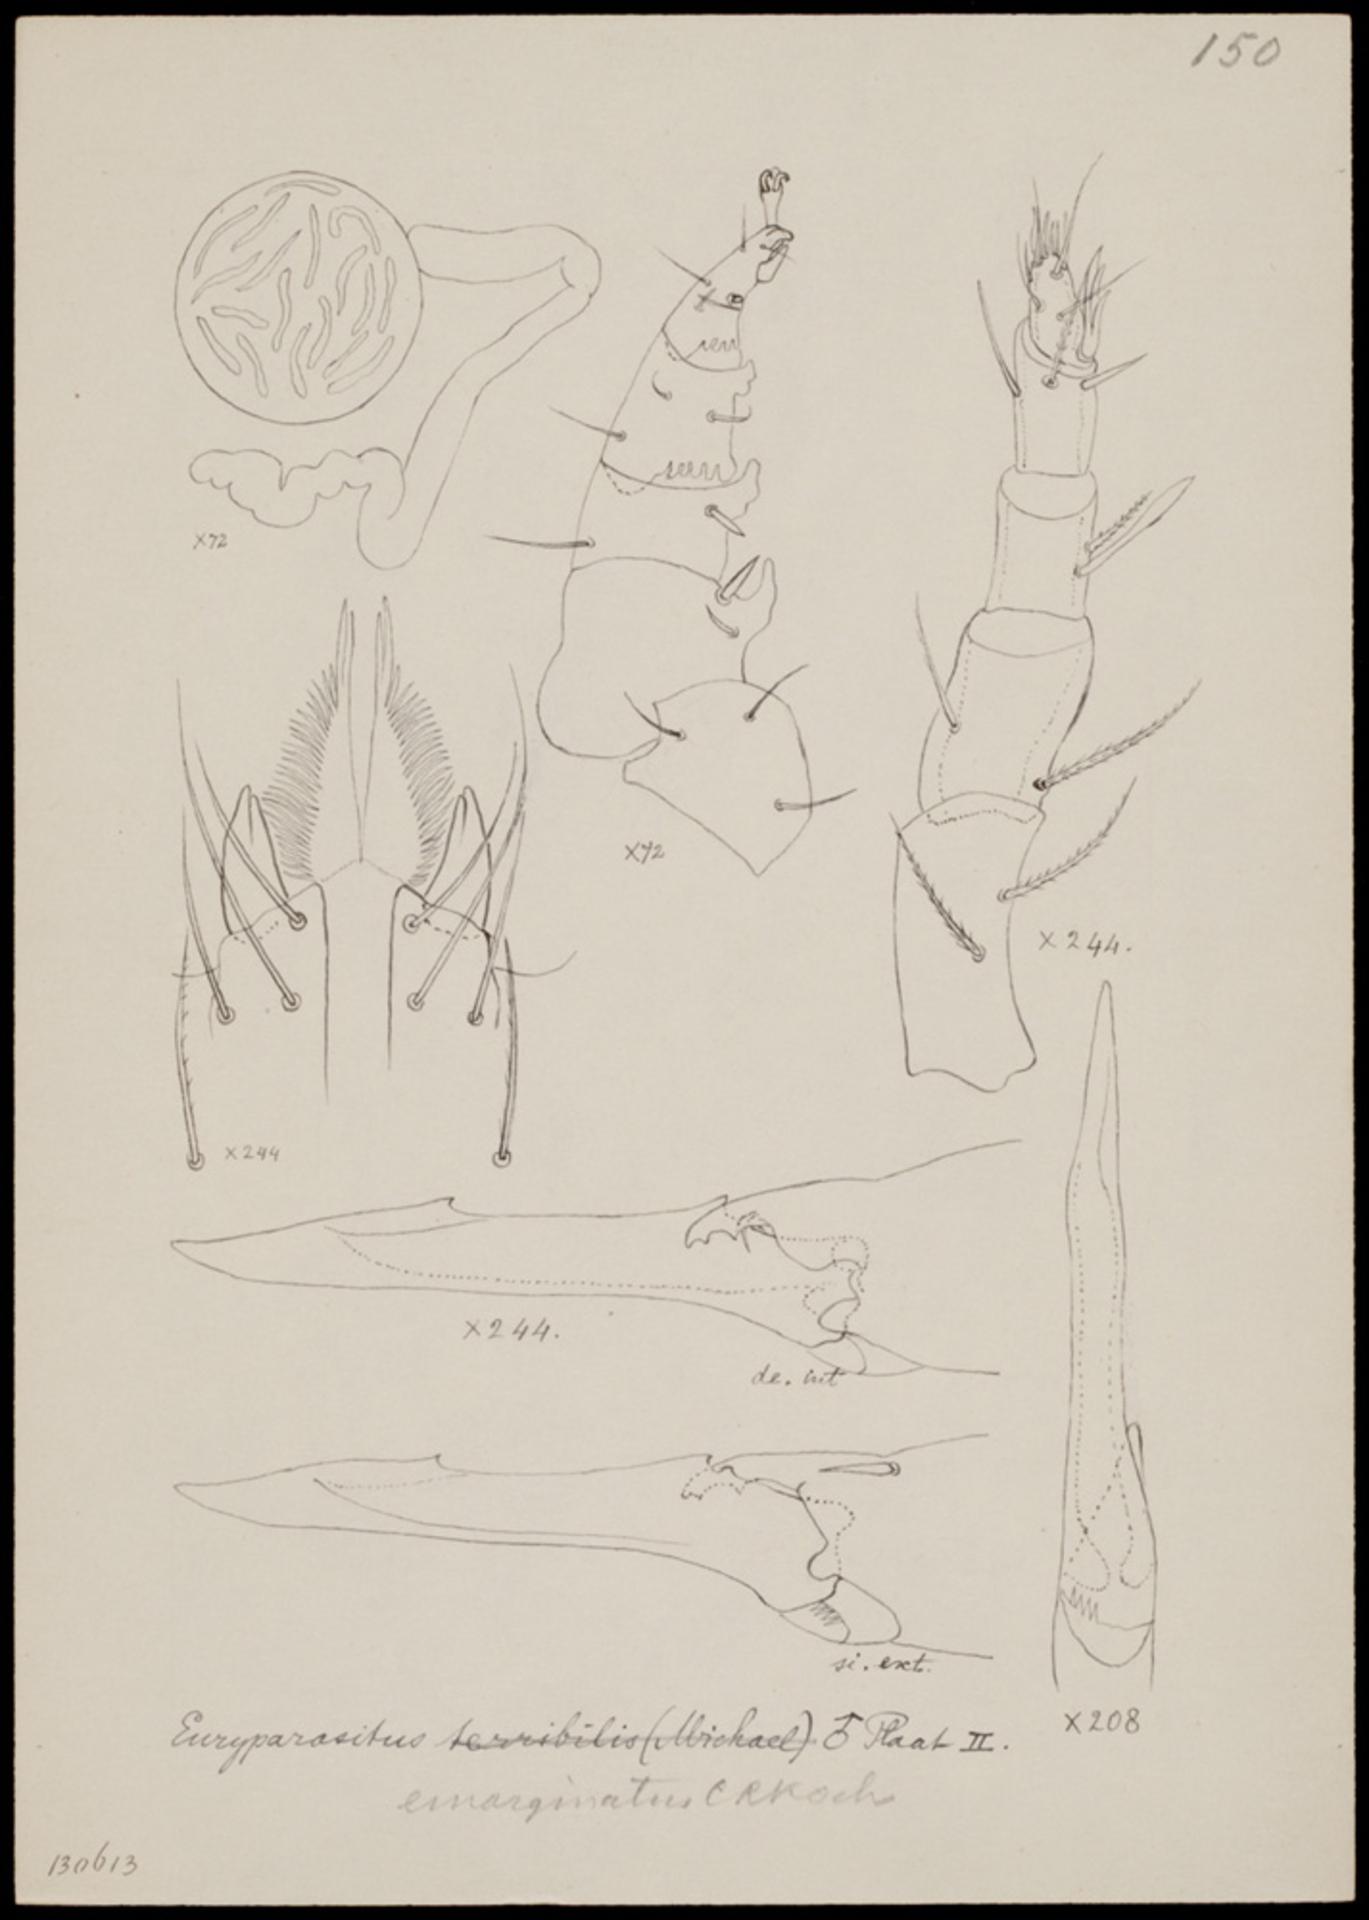 RMNH.ART.1018   Euryparasitus emarginatus (C. L. Koch)